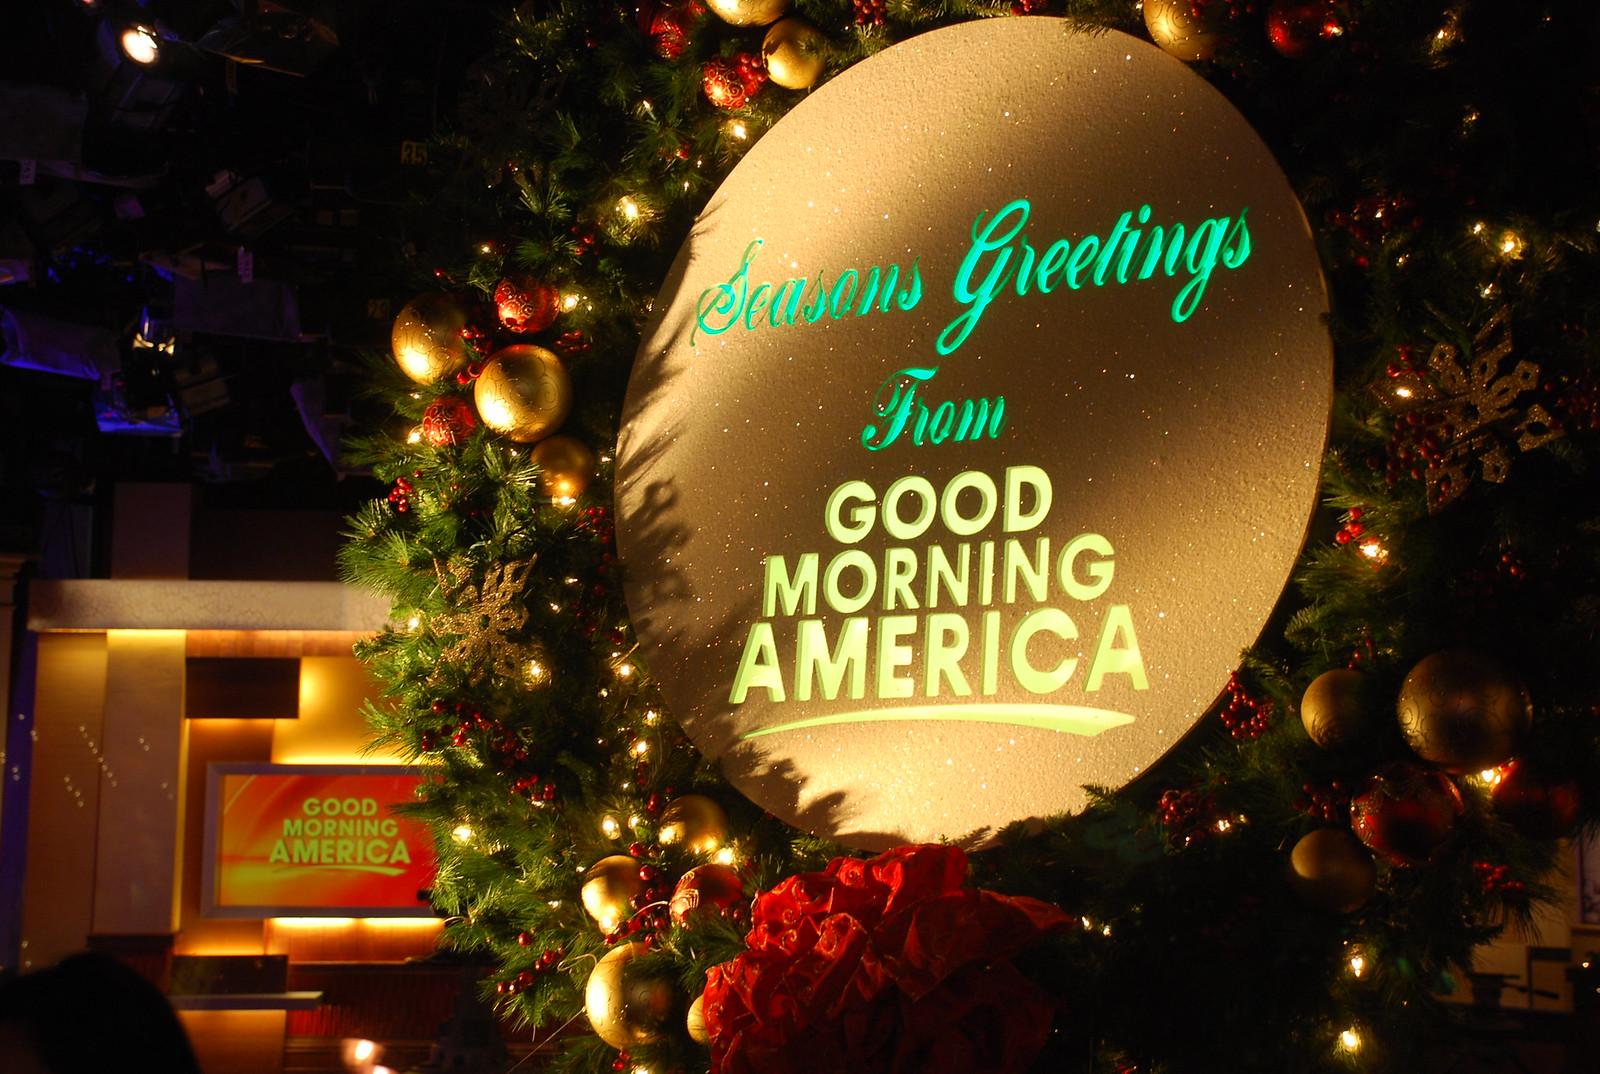 Seasons Greeting from Good Morning America